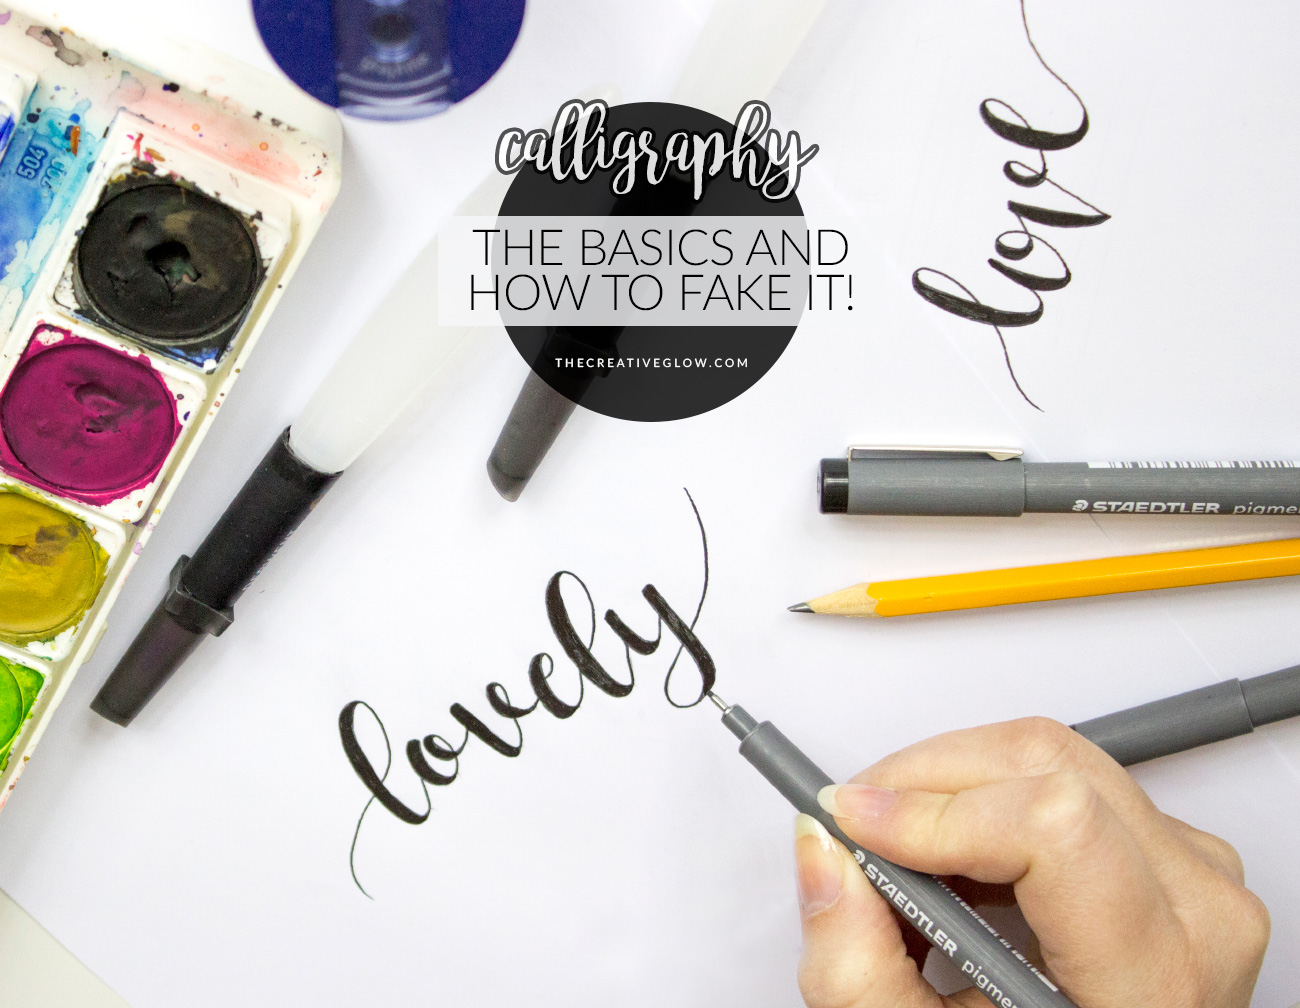 Diy calligraphy basics the 1 rule faux calligraphy Calligraphy basics